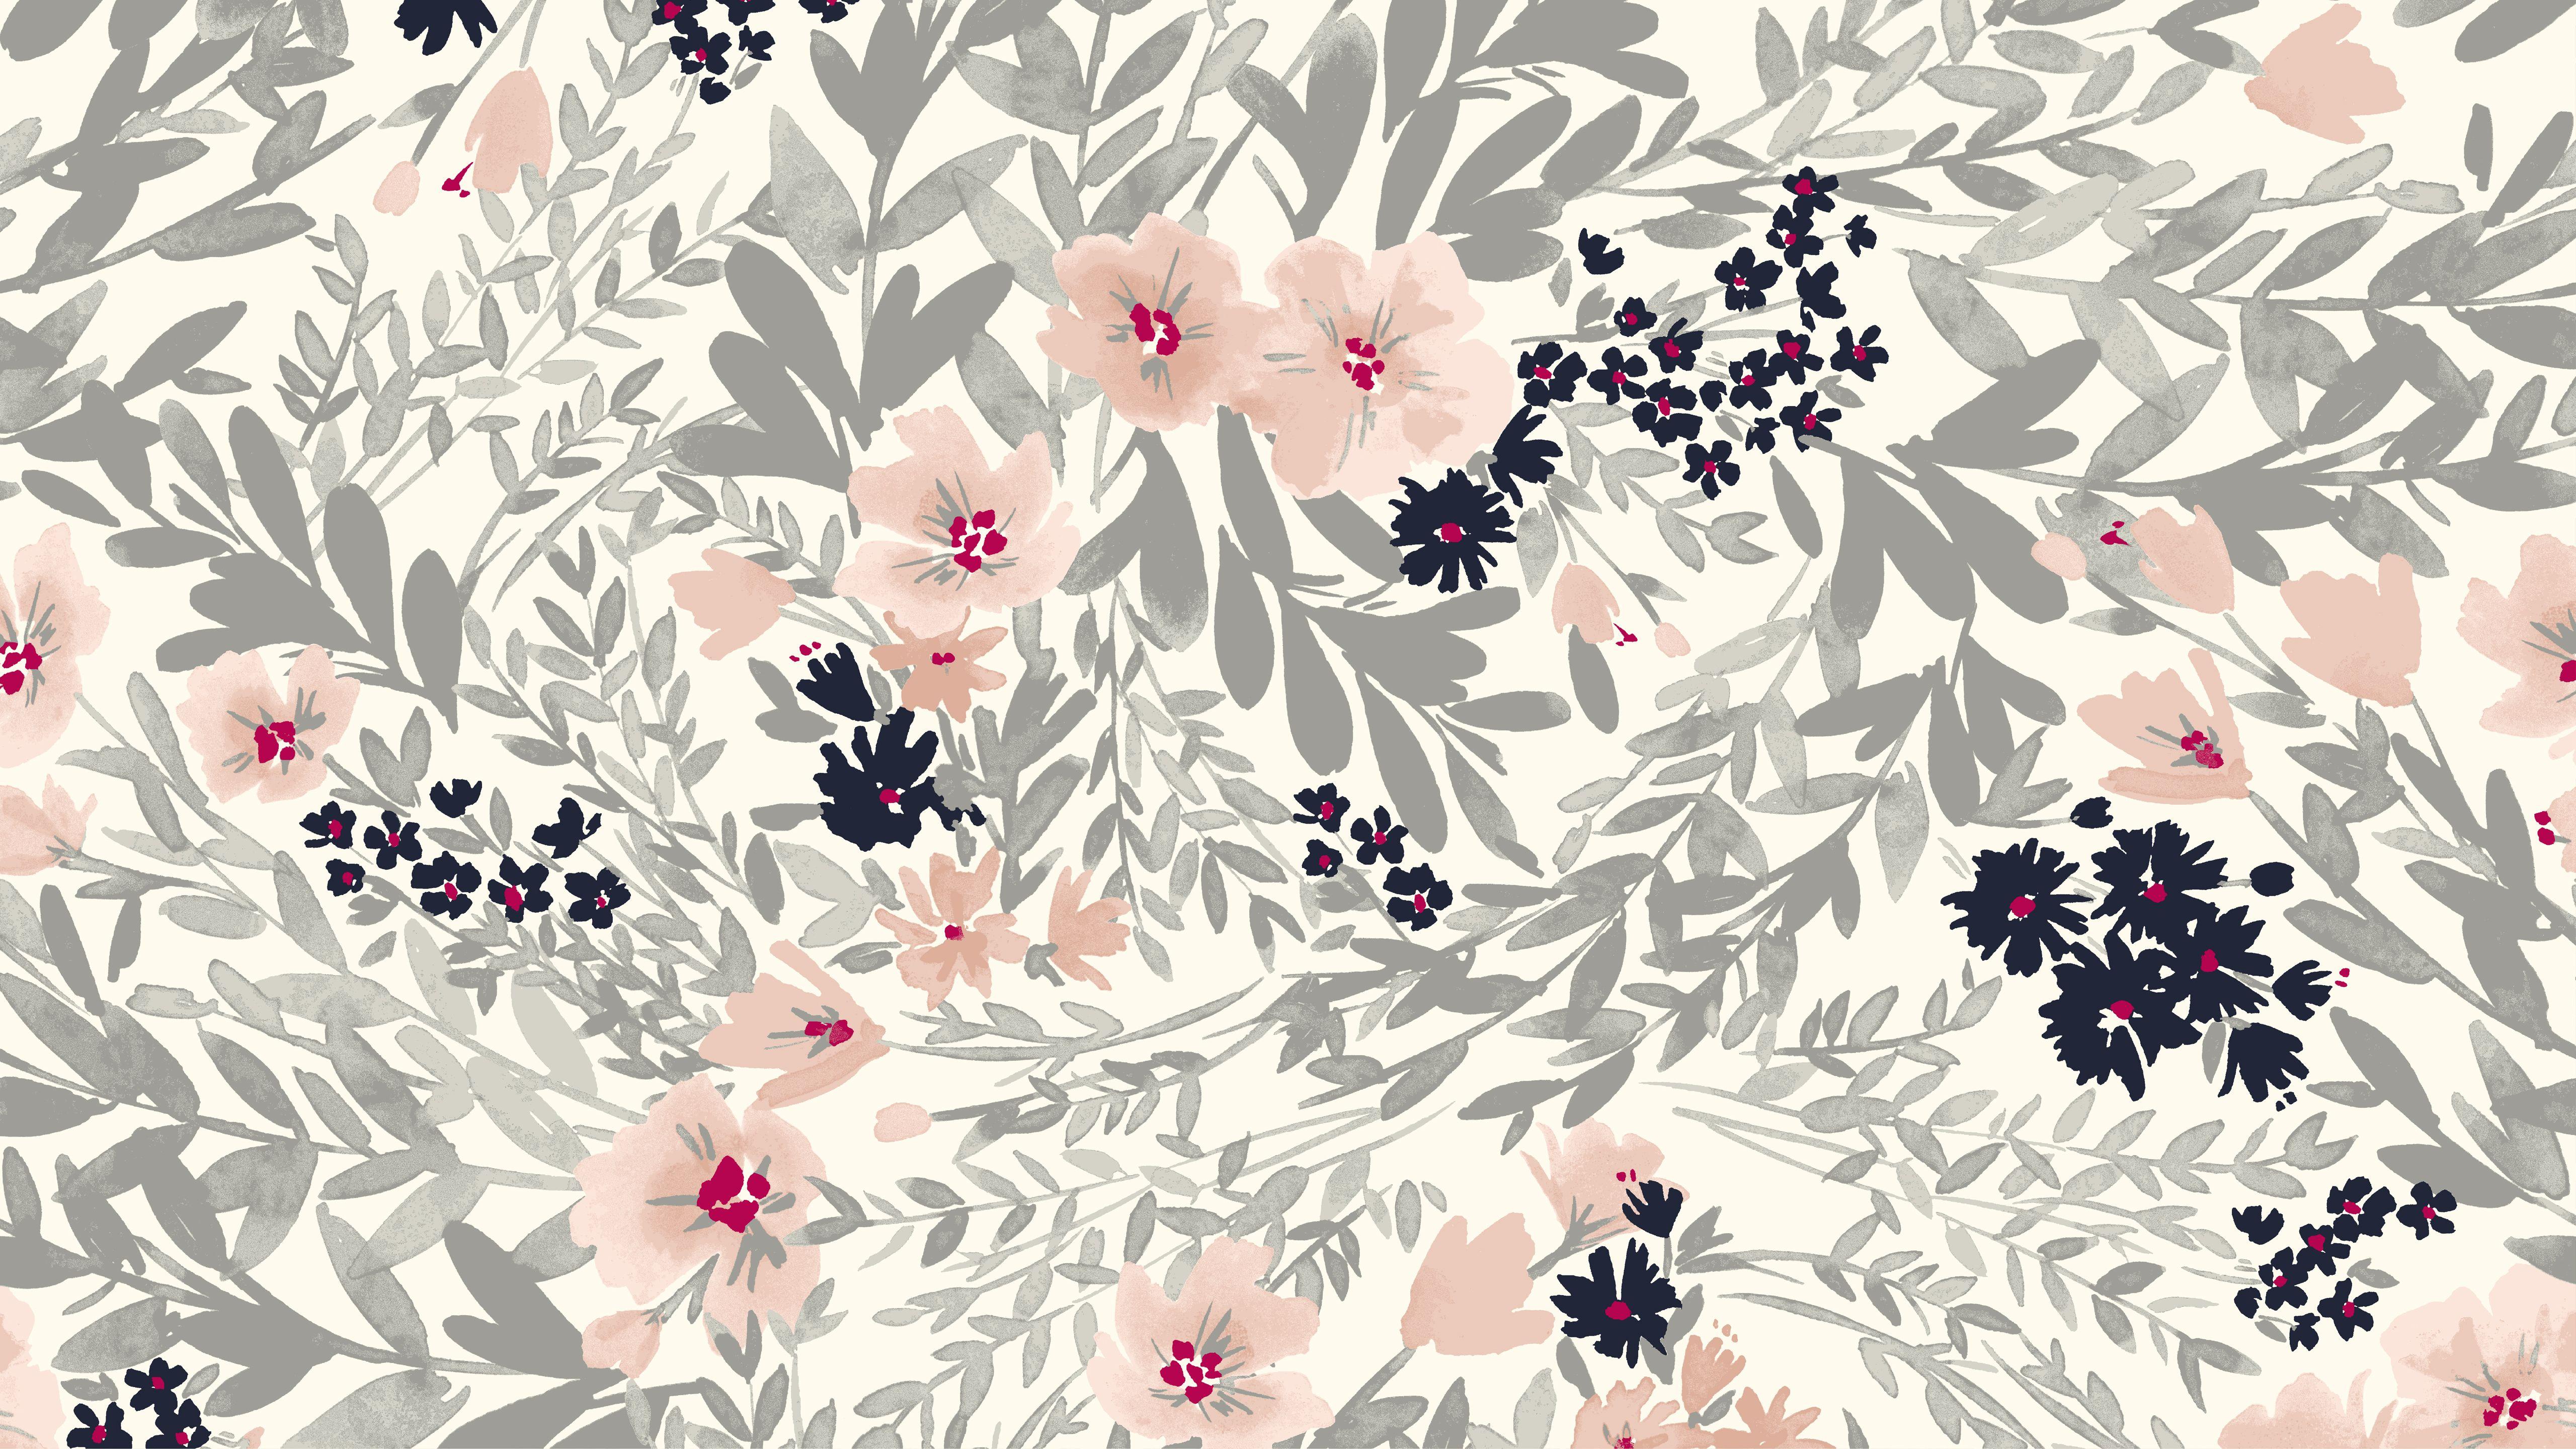 Get The Look Floral Wallpaper Desktop Kate Spade Desktop Wallpaper Computer Wallpaper Pattern